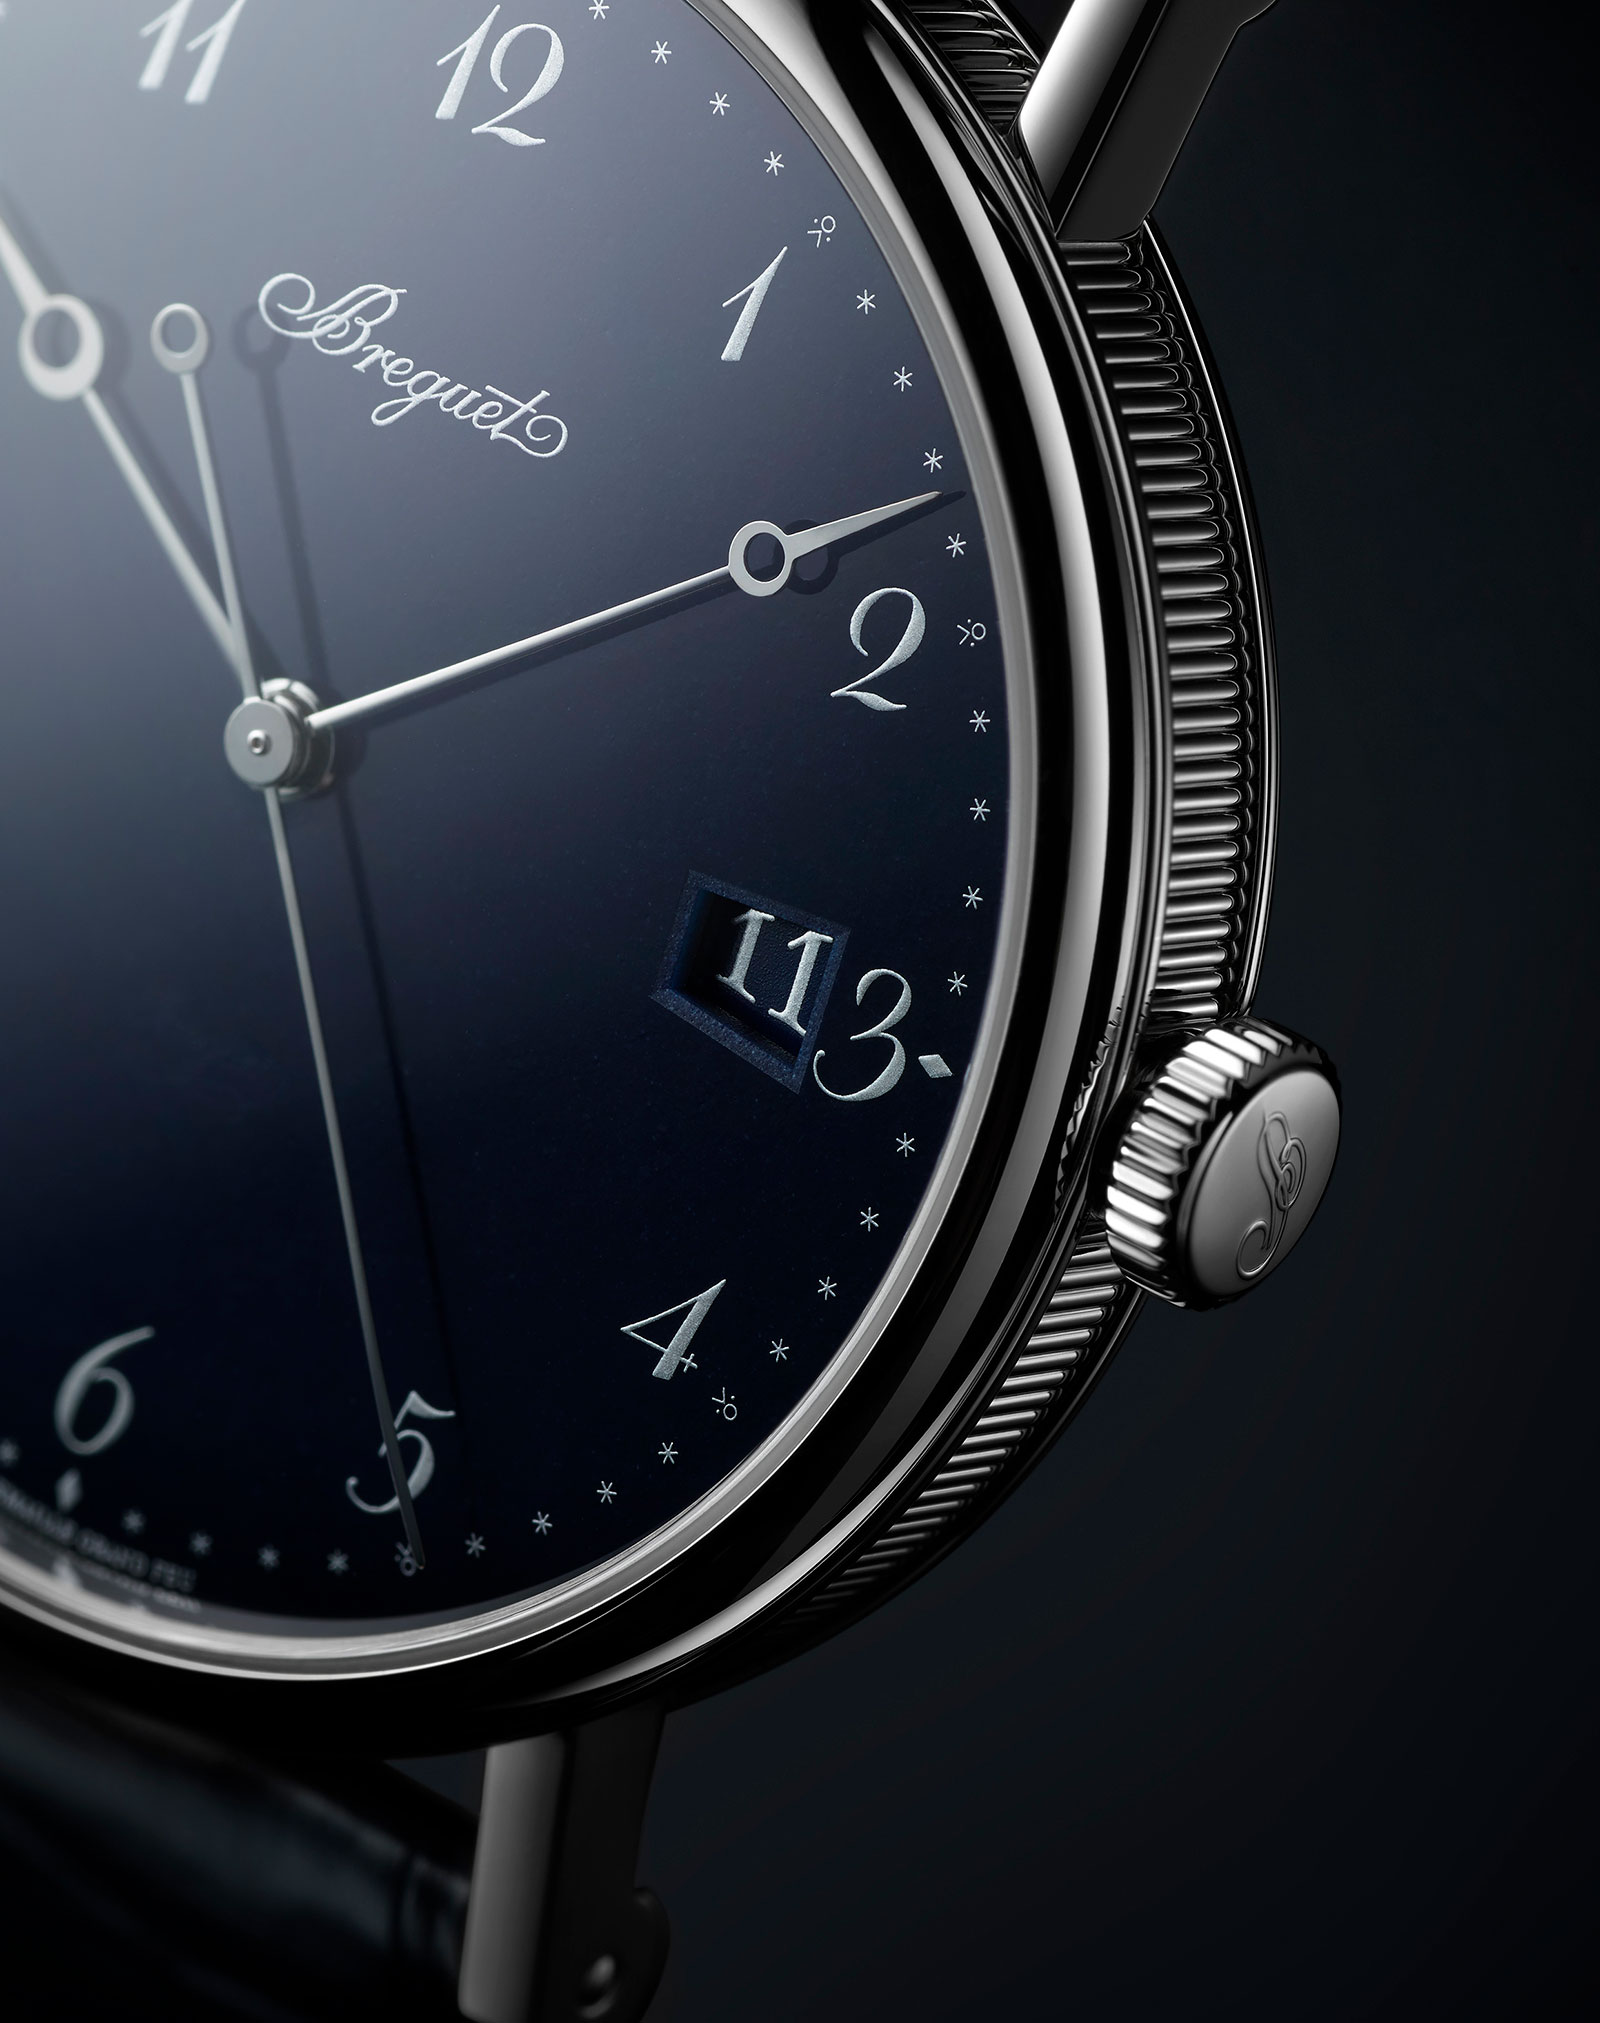 Breguet Classique 5177 blue enamel 2